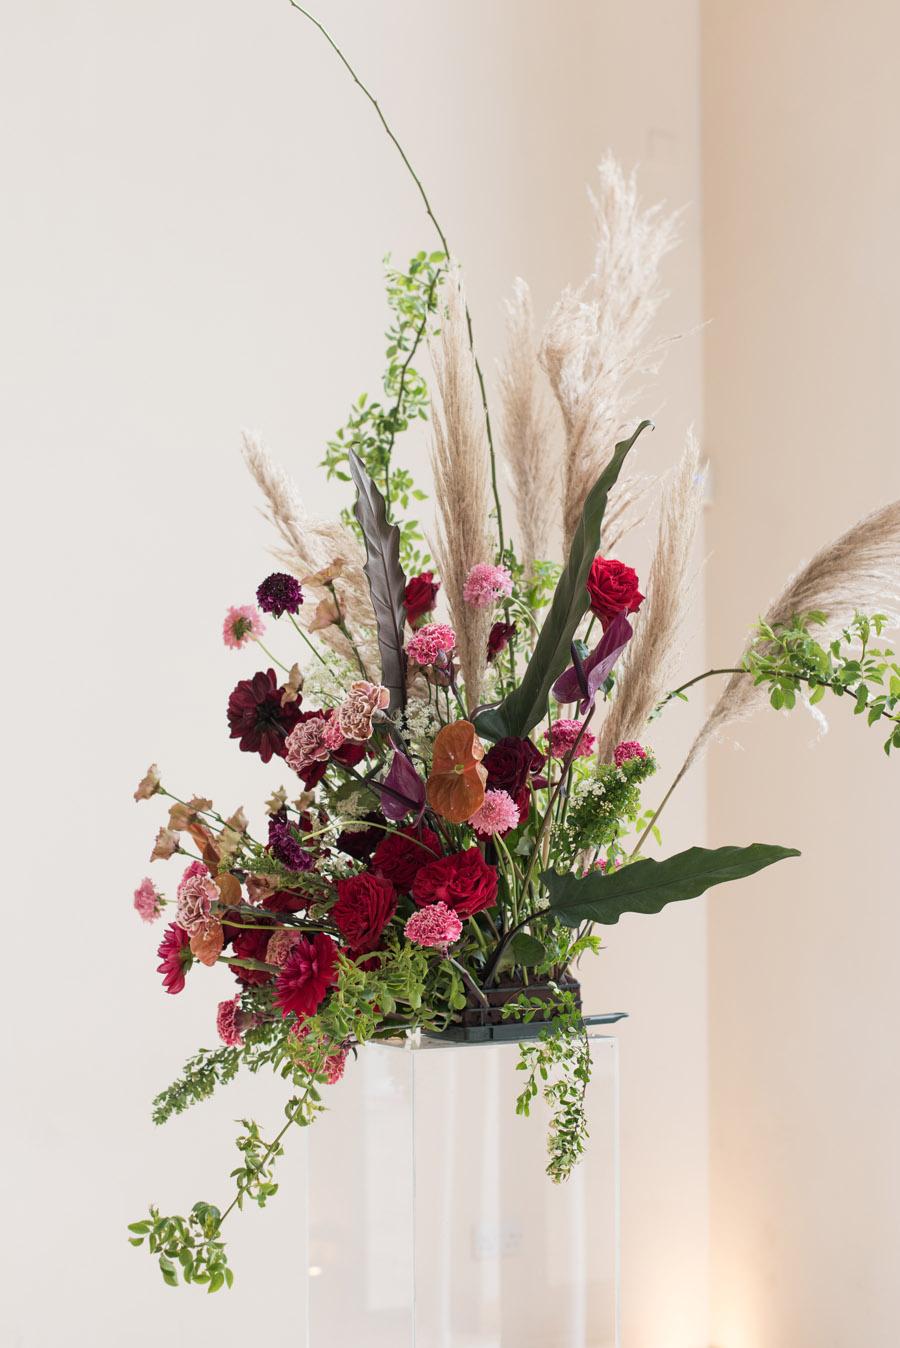 floral wedding ideas at Millbridge Court on English Wedding - photo credit Julie Michaelsen Photography (7)